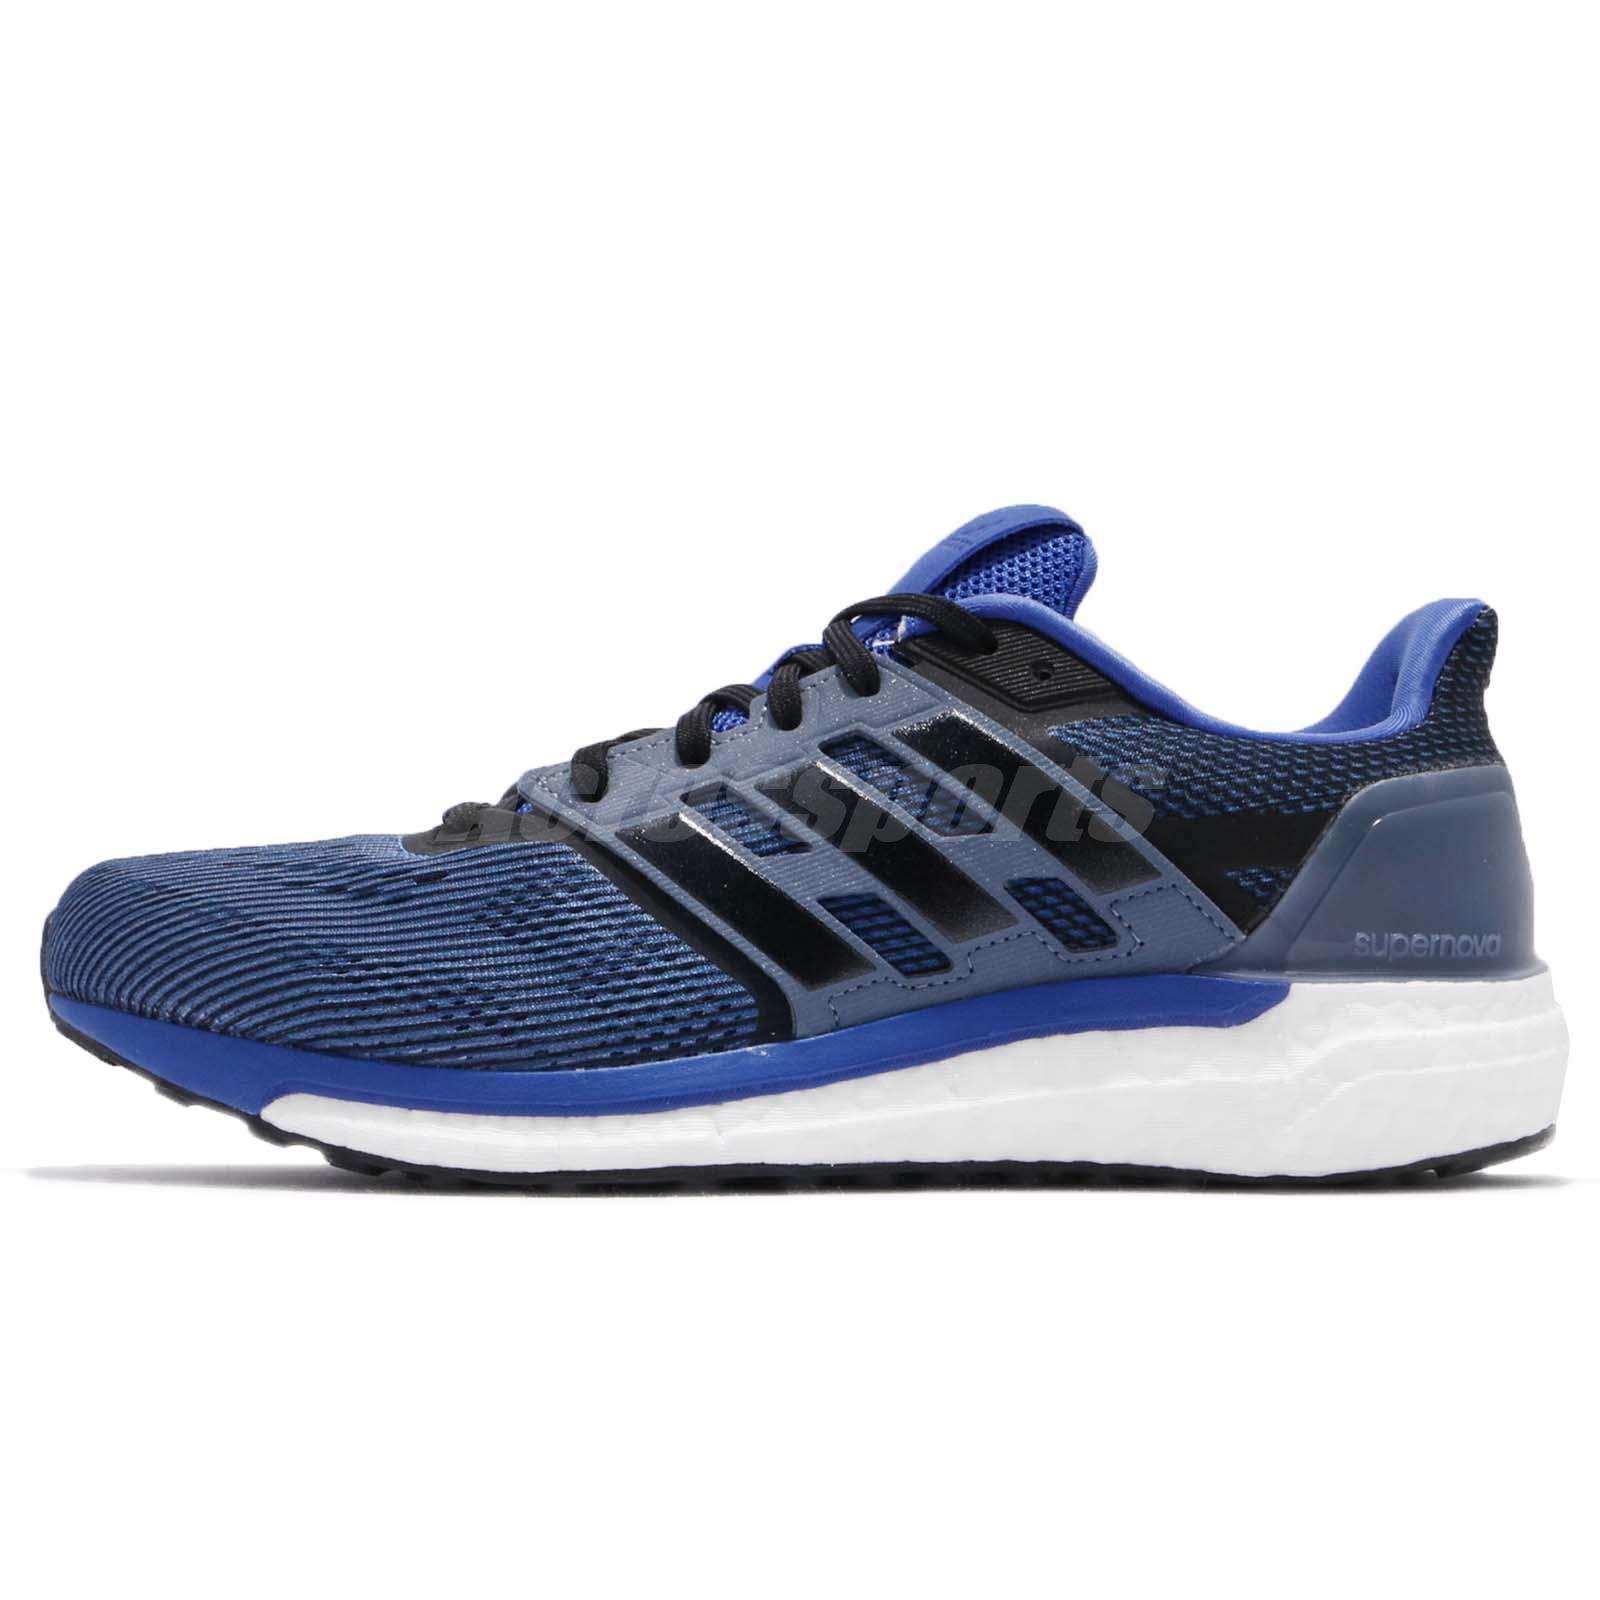 adidas Supernova M Hi-Res Blue Black Steel Men Running Shoes Sneakers CG4020 631f1b0c7